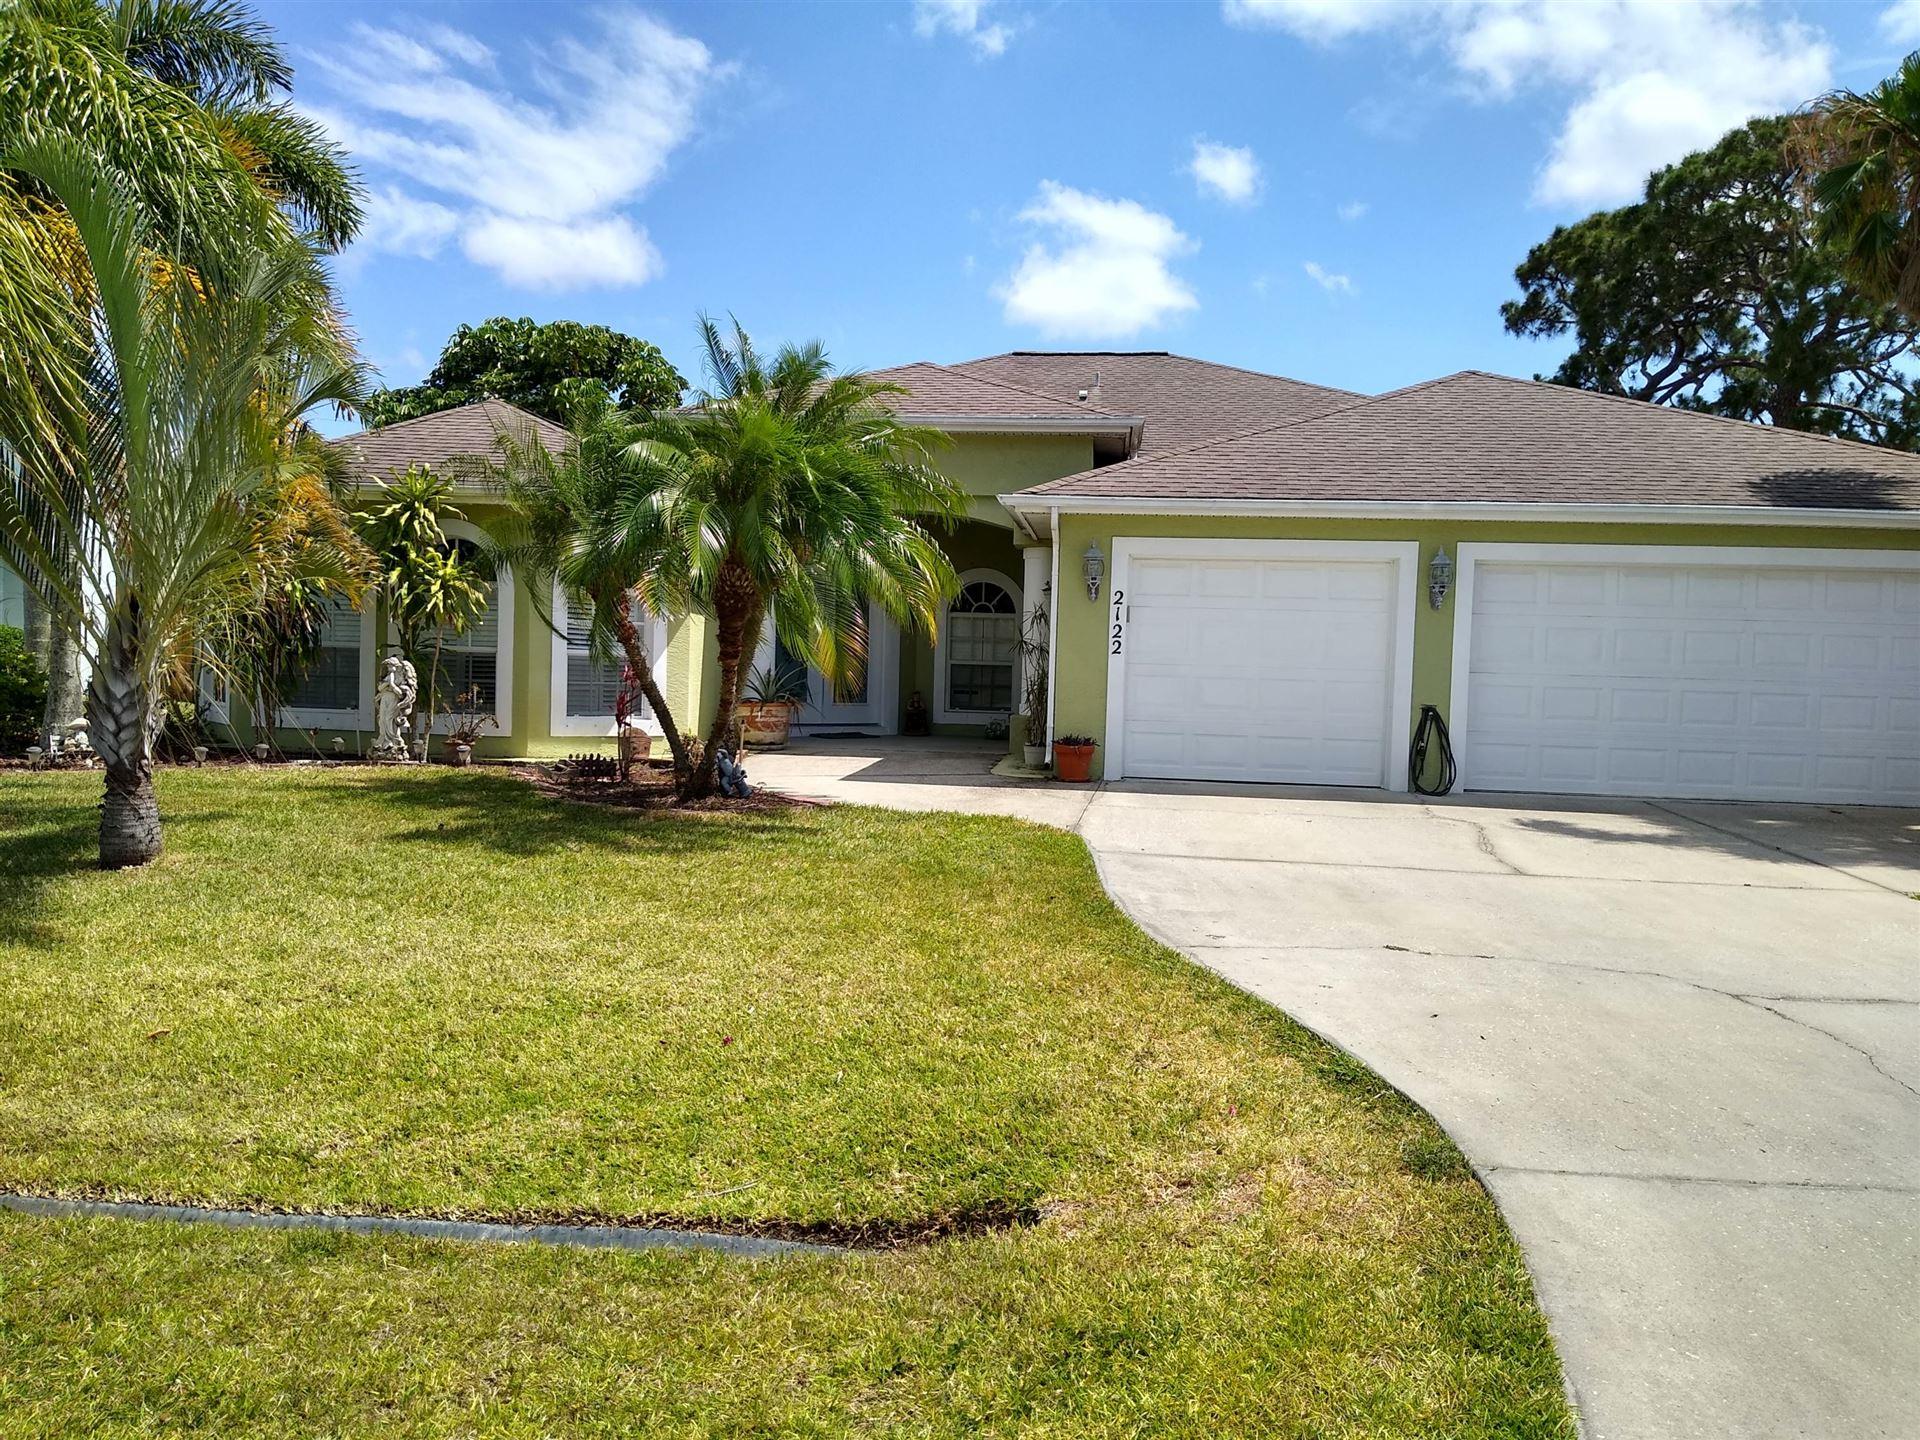 2122 SE Dolphin Road, Port Saint Lucie, FL 34952 - MLS#: RX-10723529